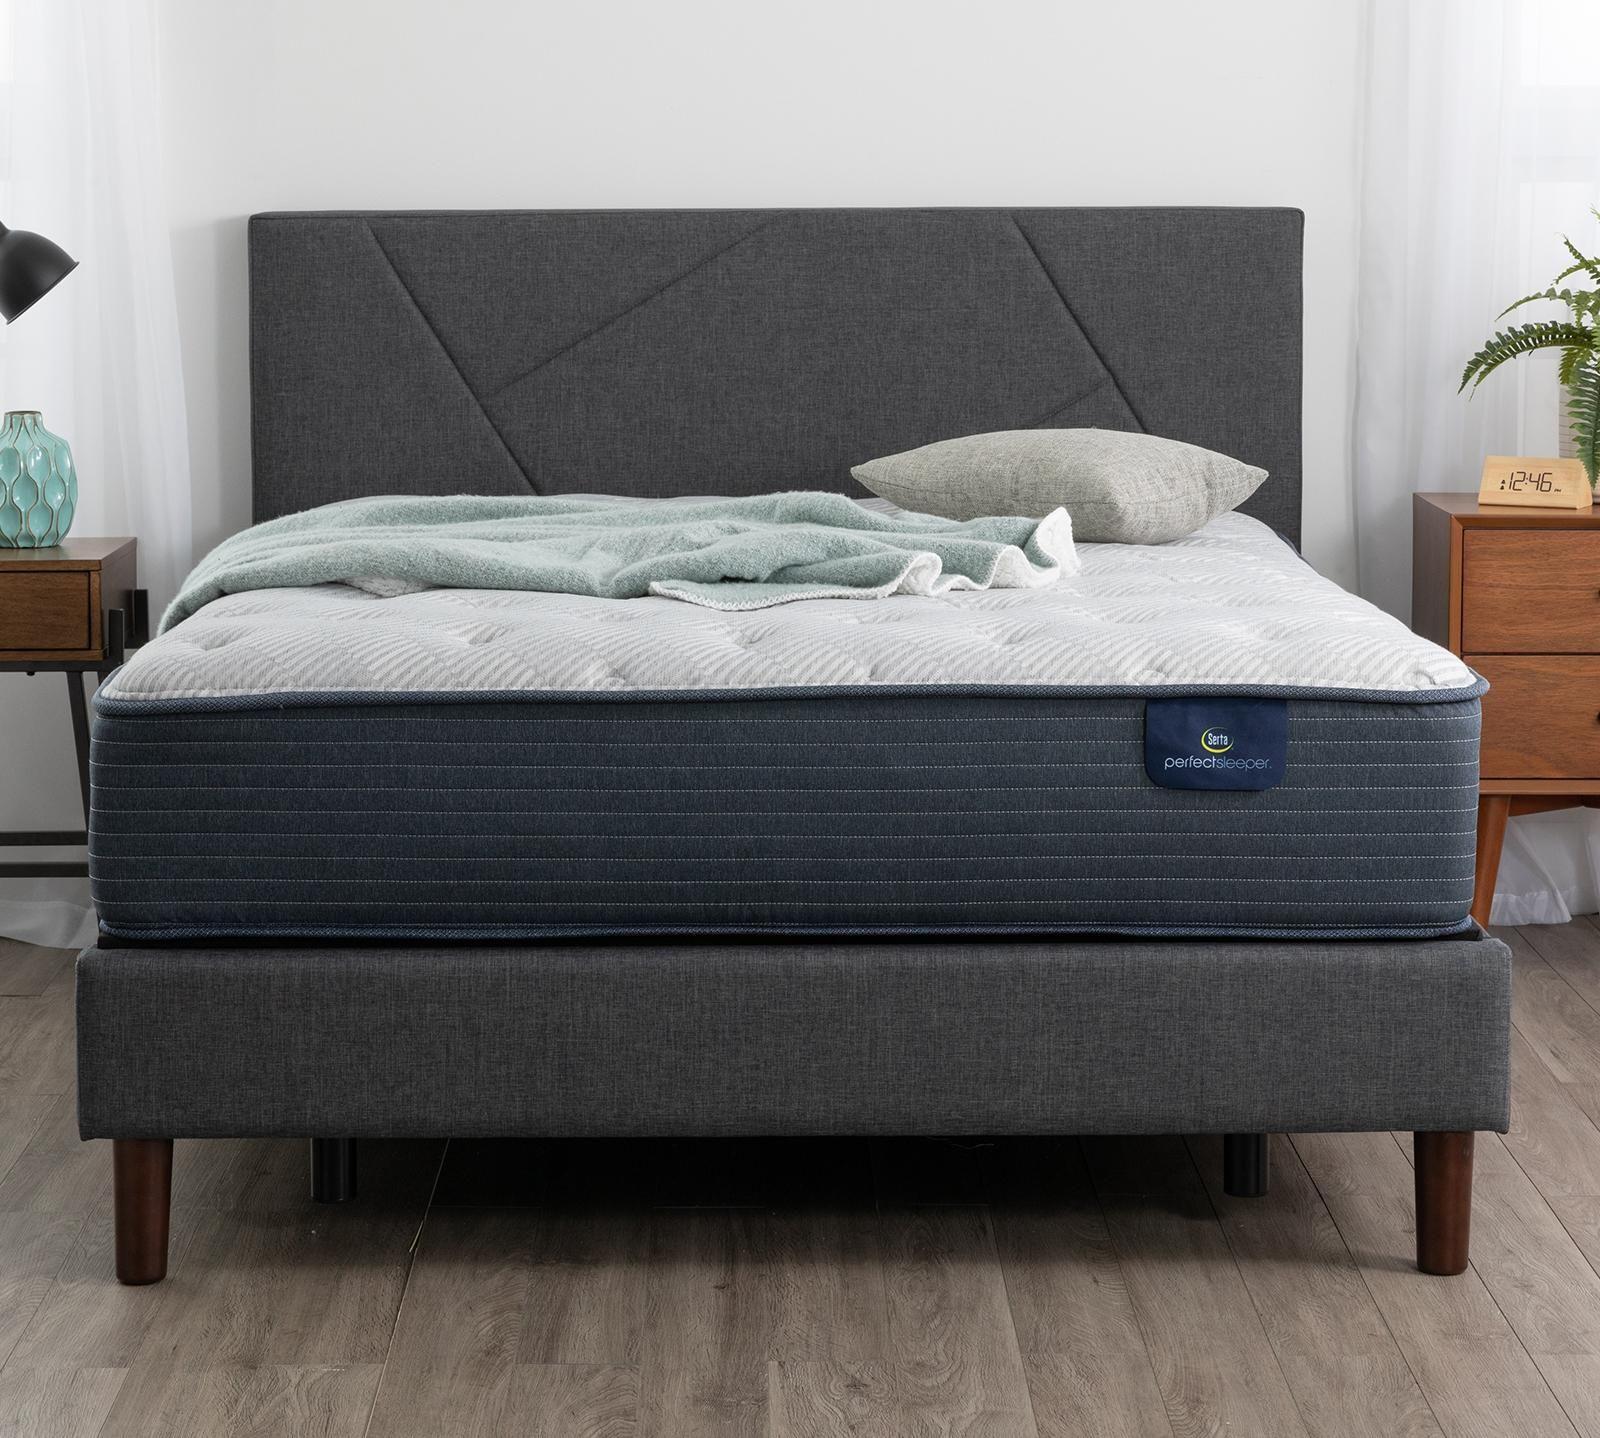 firm mattress serta perfect sleeper